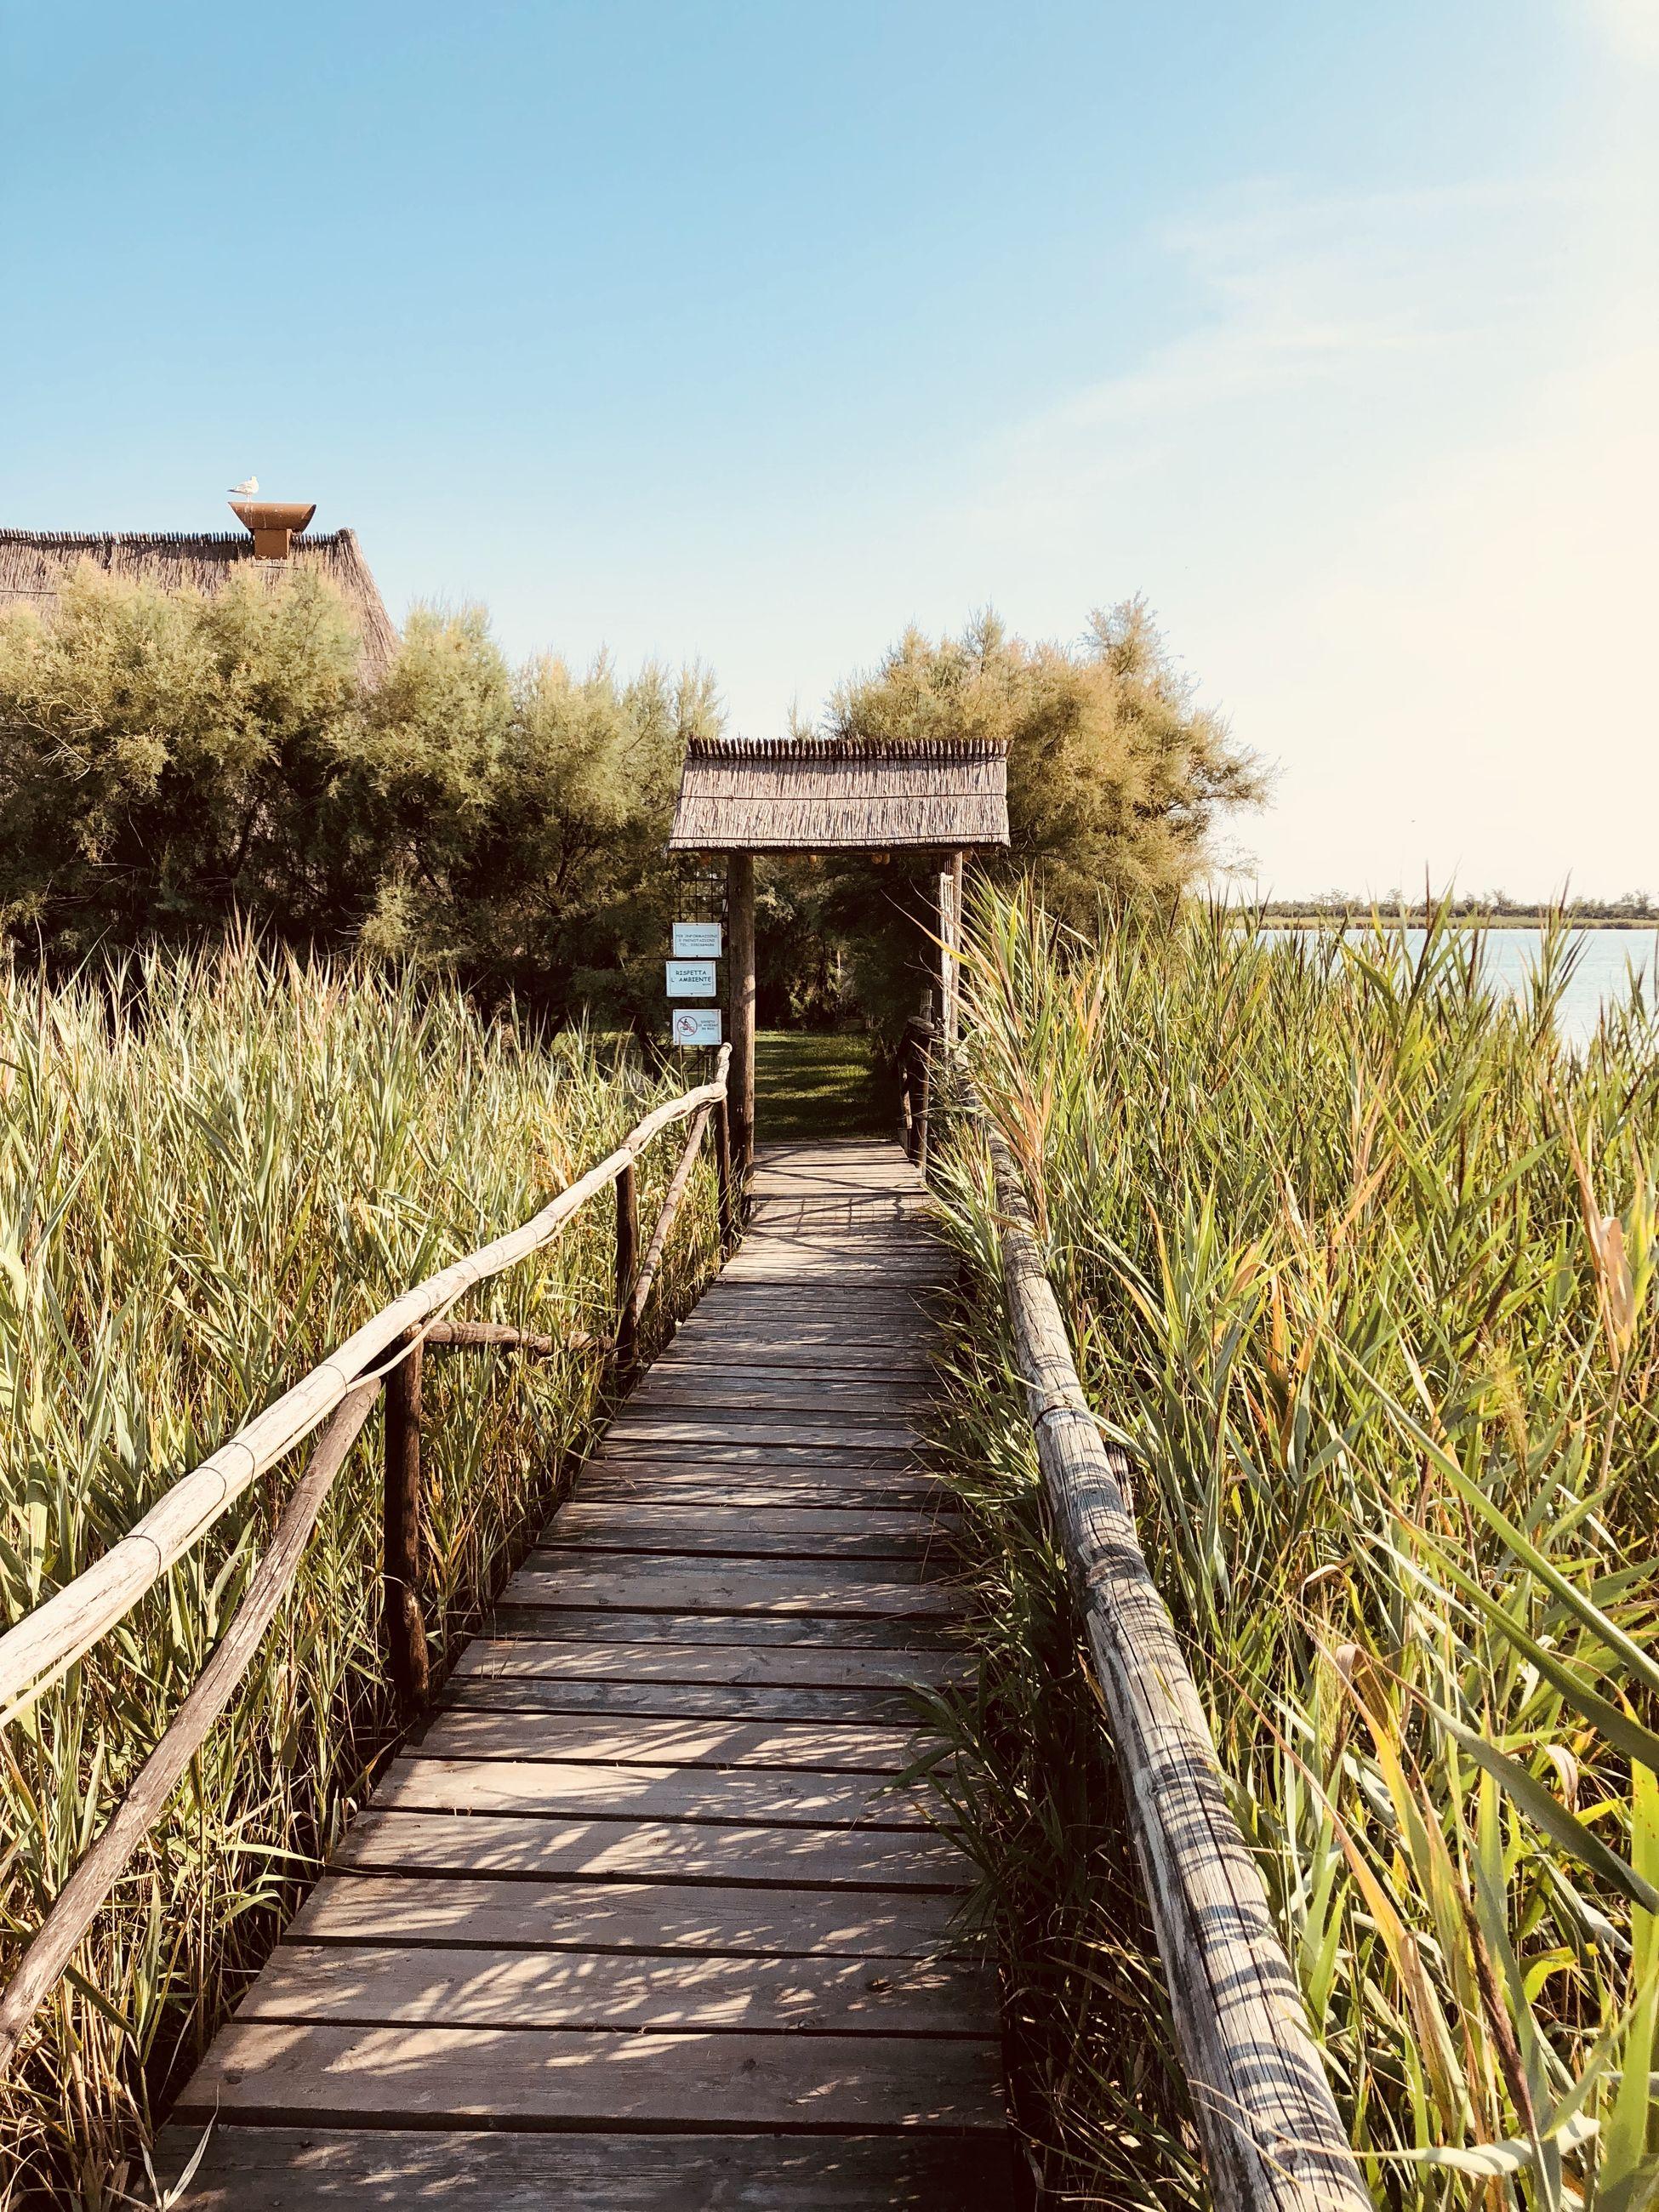 Boardwalk amidst plants against sky